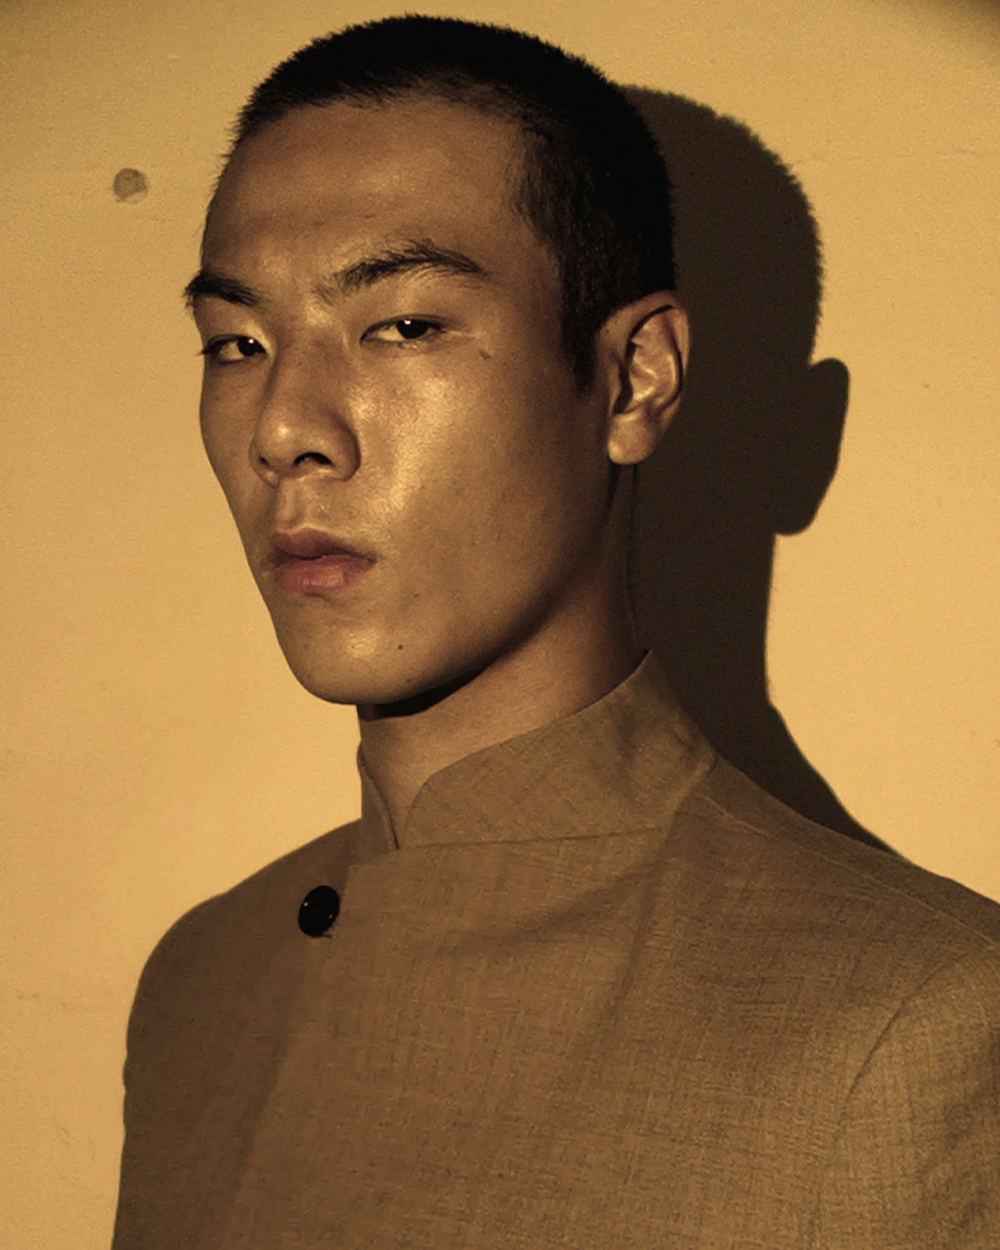 Ron Wan with model Jonathon Wong in Yat Pit